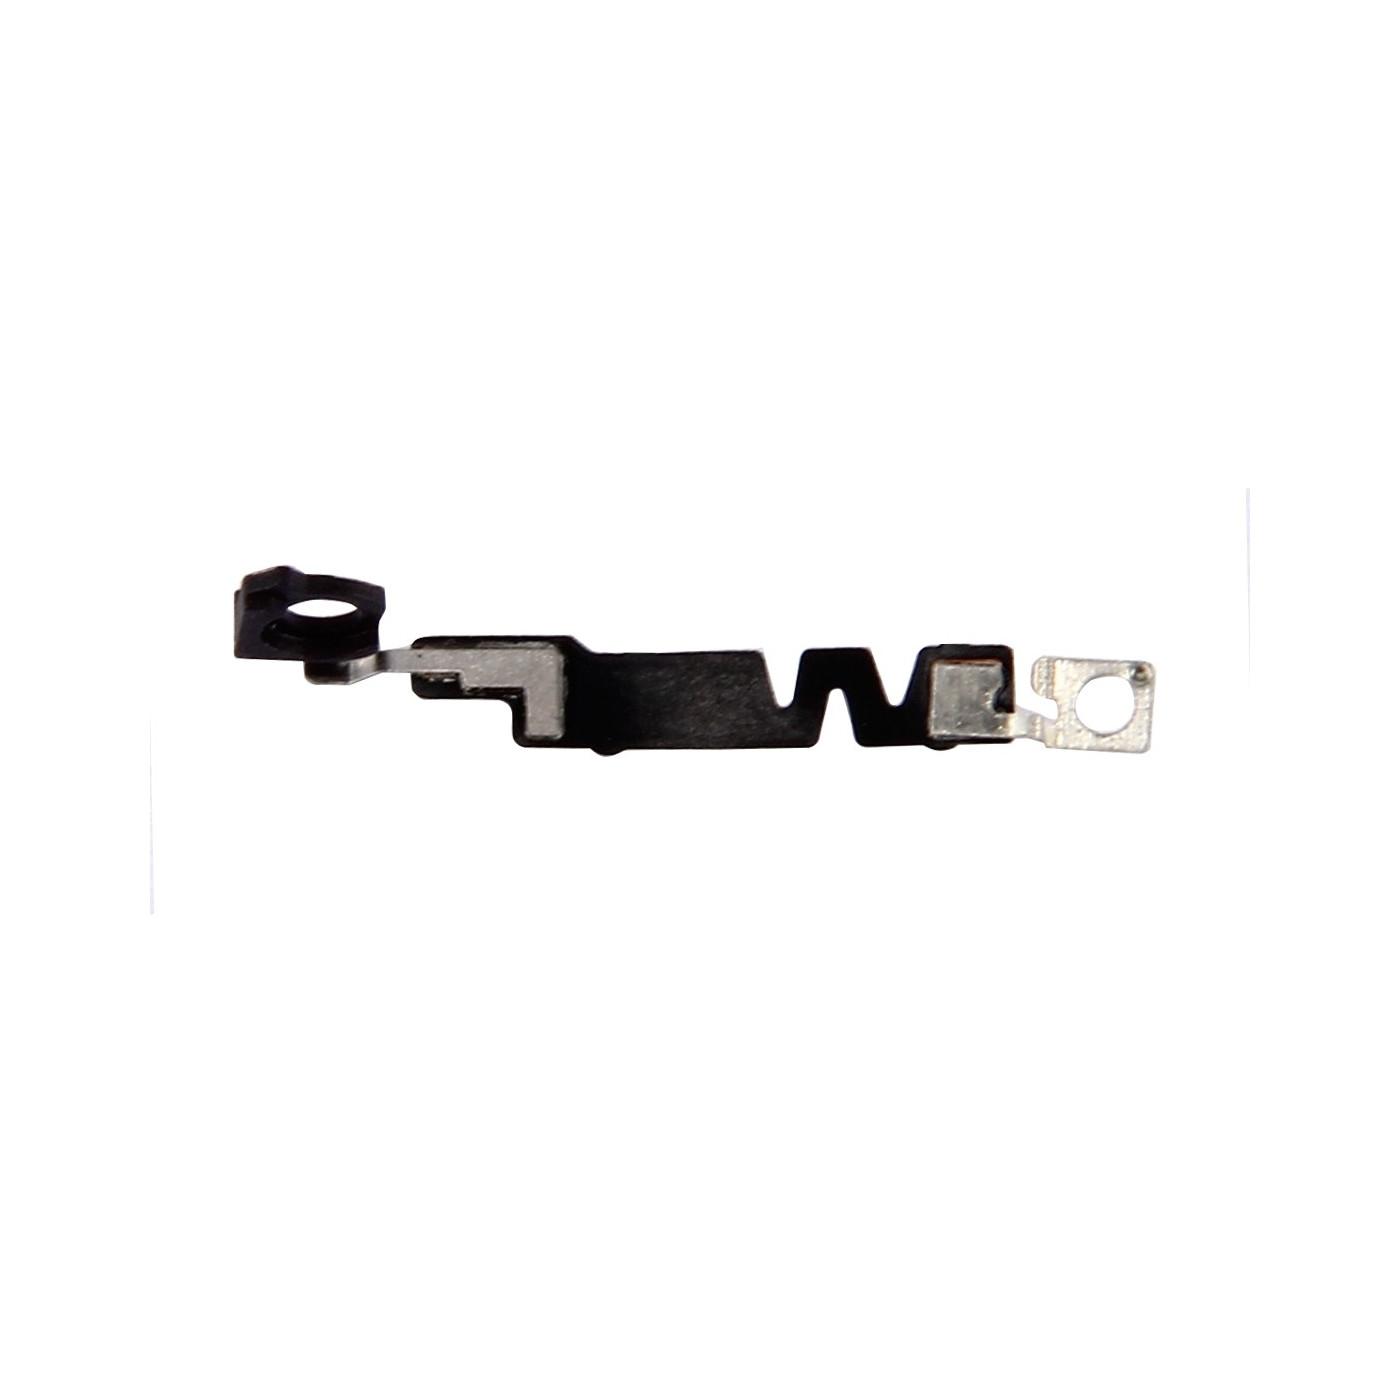 Antenna segnale Bluetooth per iPhone 7 Flex Cable